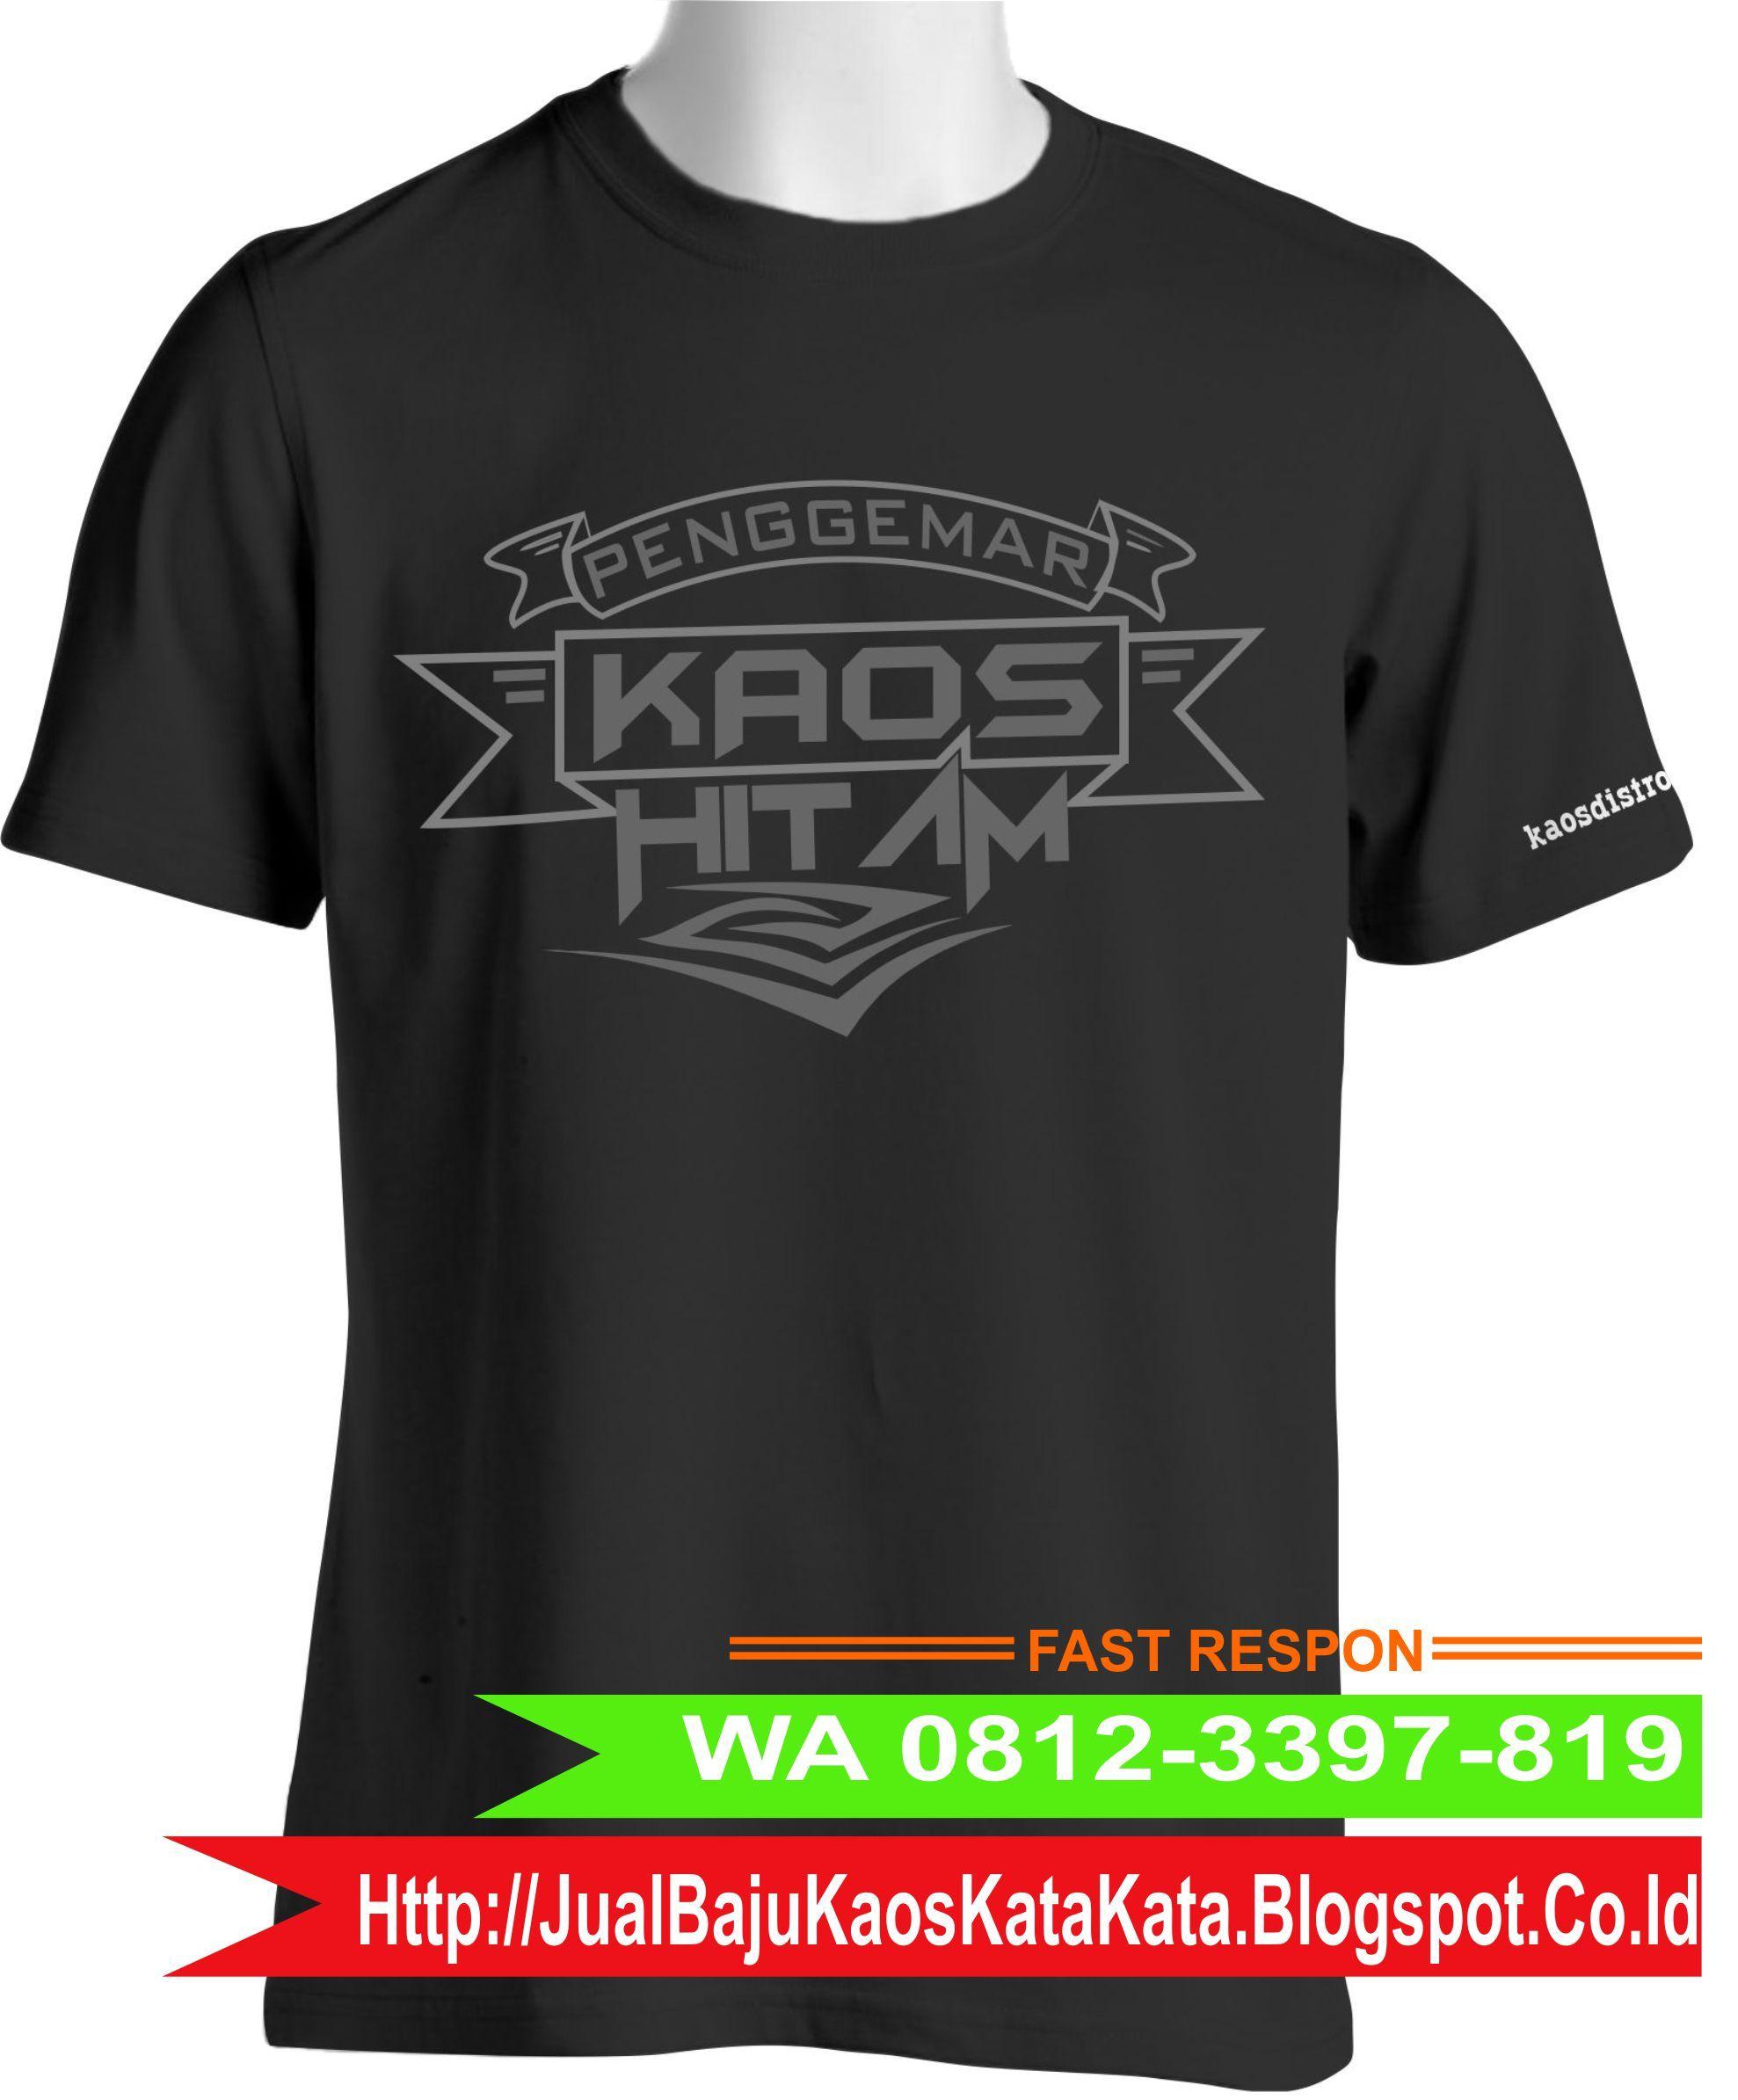 Pin By Kaos Kata Unik Keren Gaul Malang On Wa 0812 3397 819 Anak Jogja Surabaya